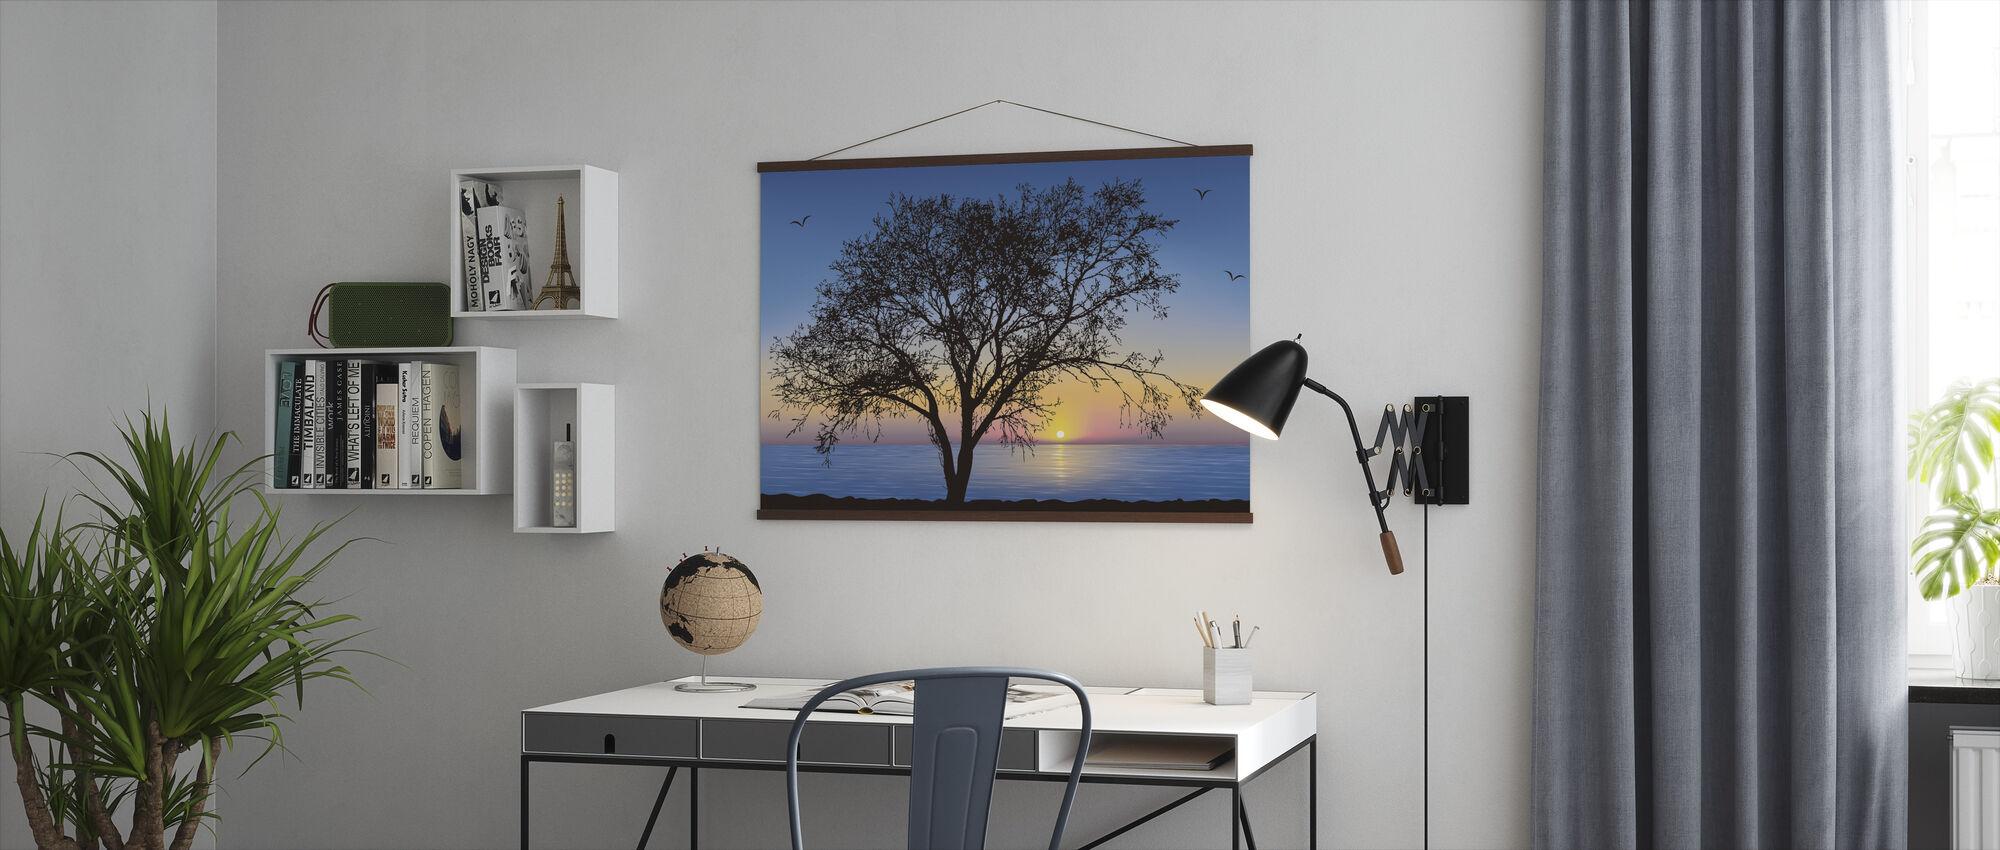 Treet Silhouette - Plakat - Kontor